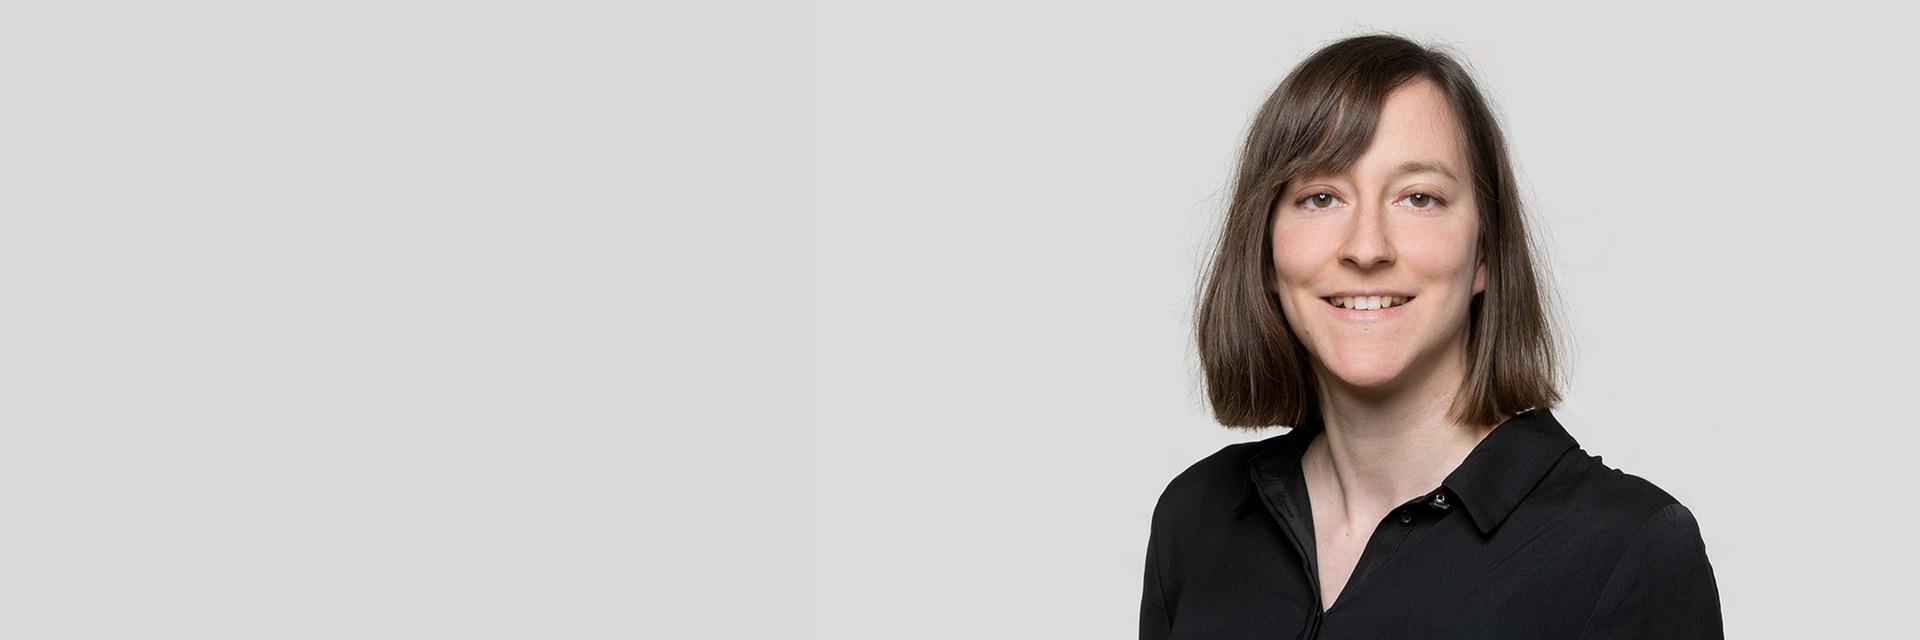 Nathalie Pasche, MA